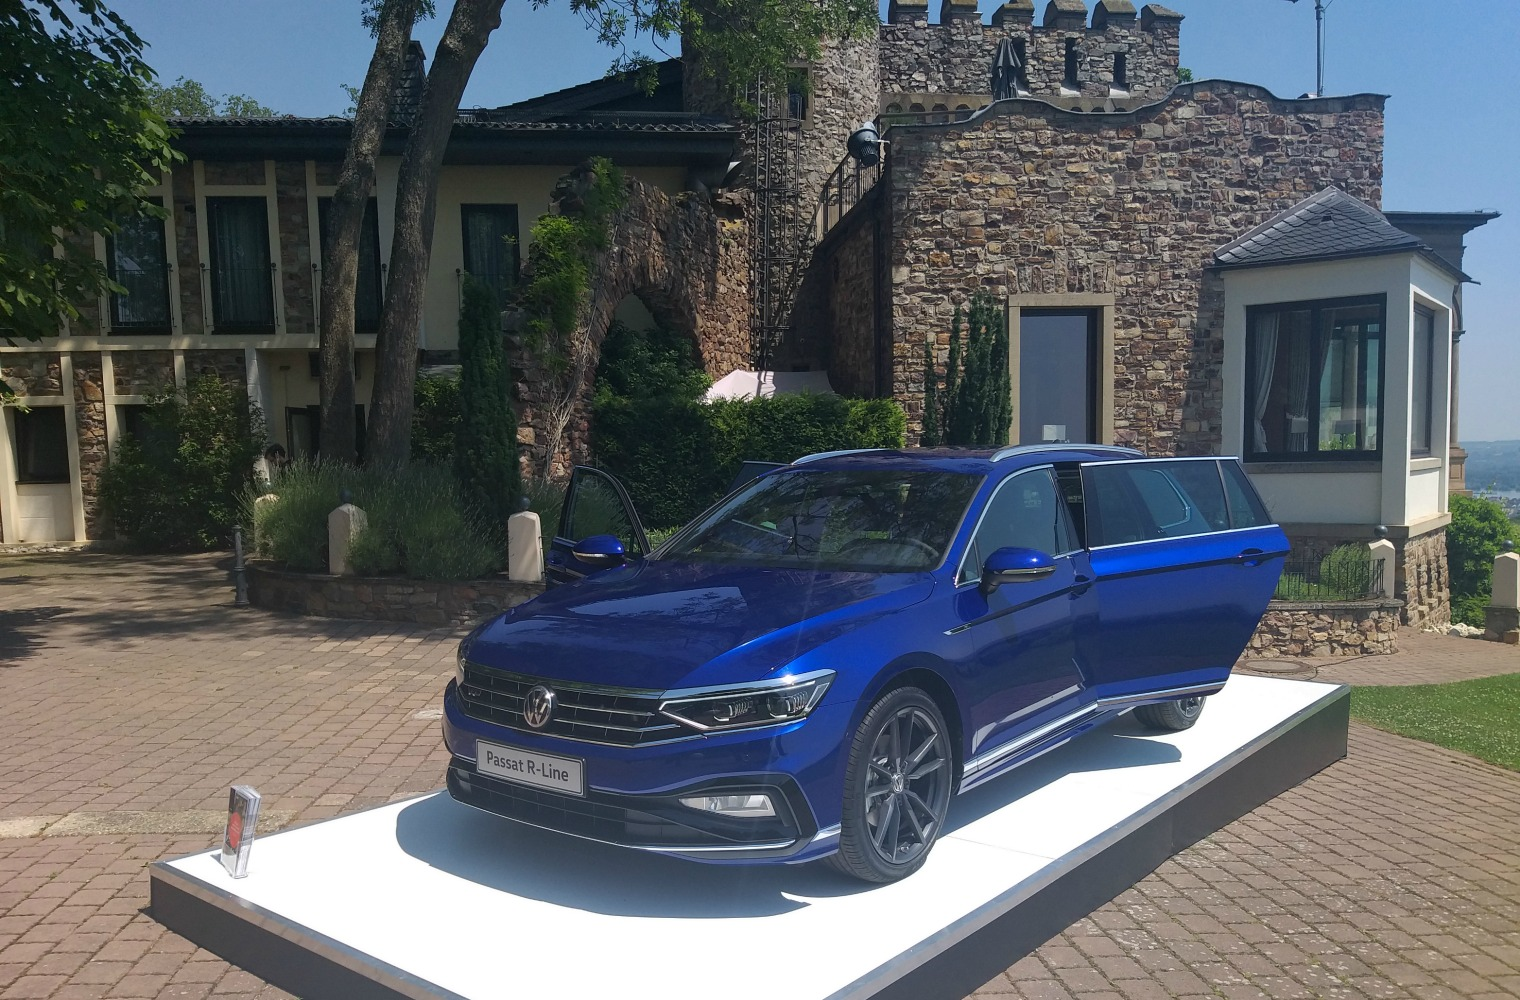 nuova Volkswagen Passat 2019 Francoforte